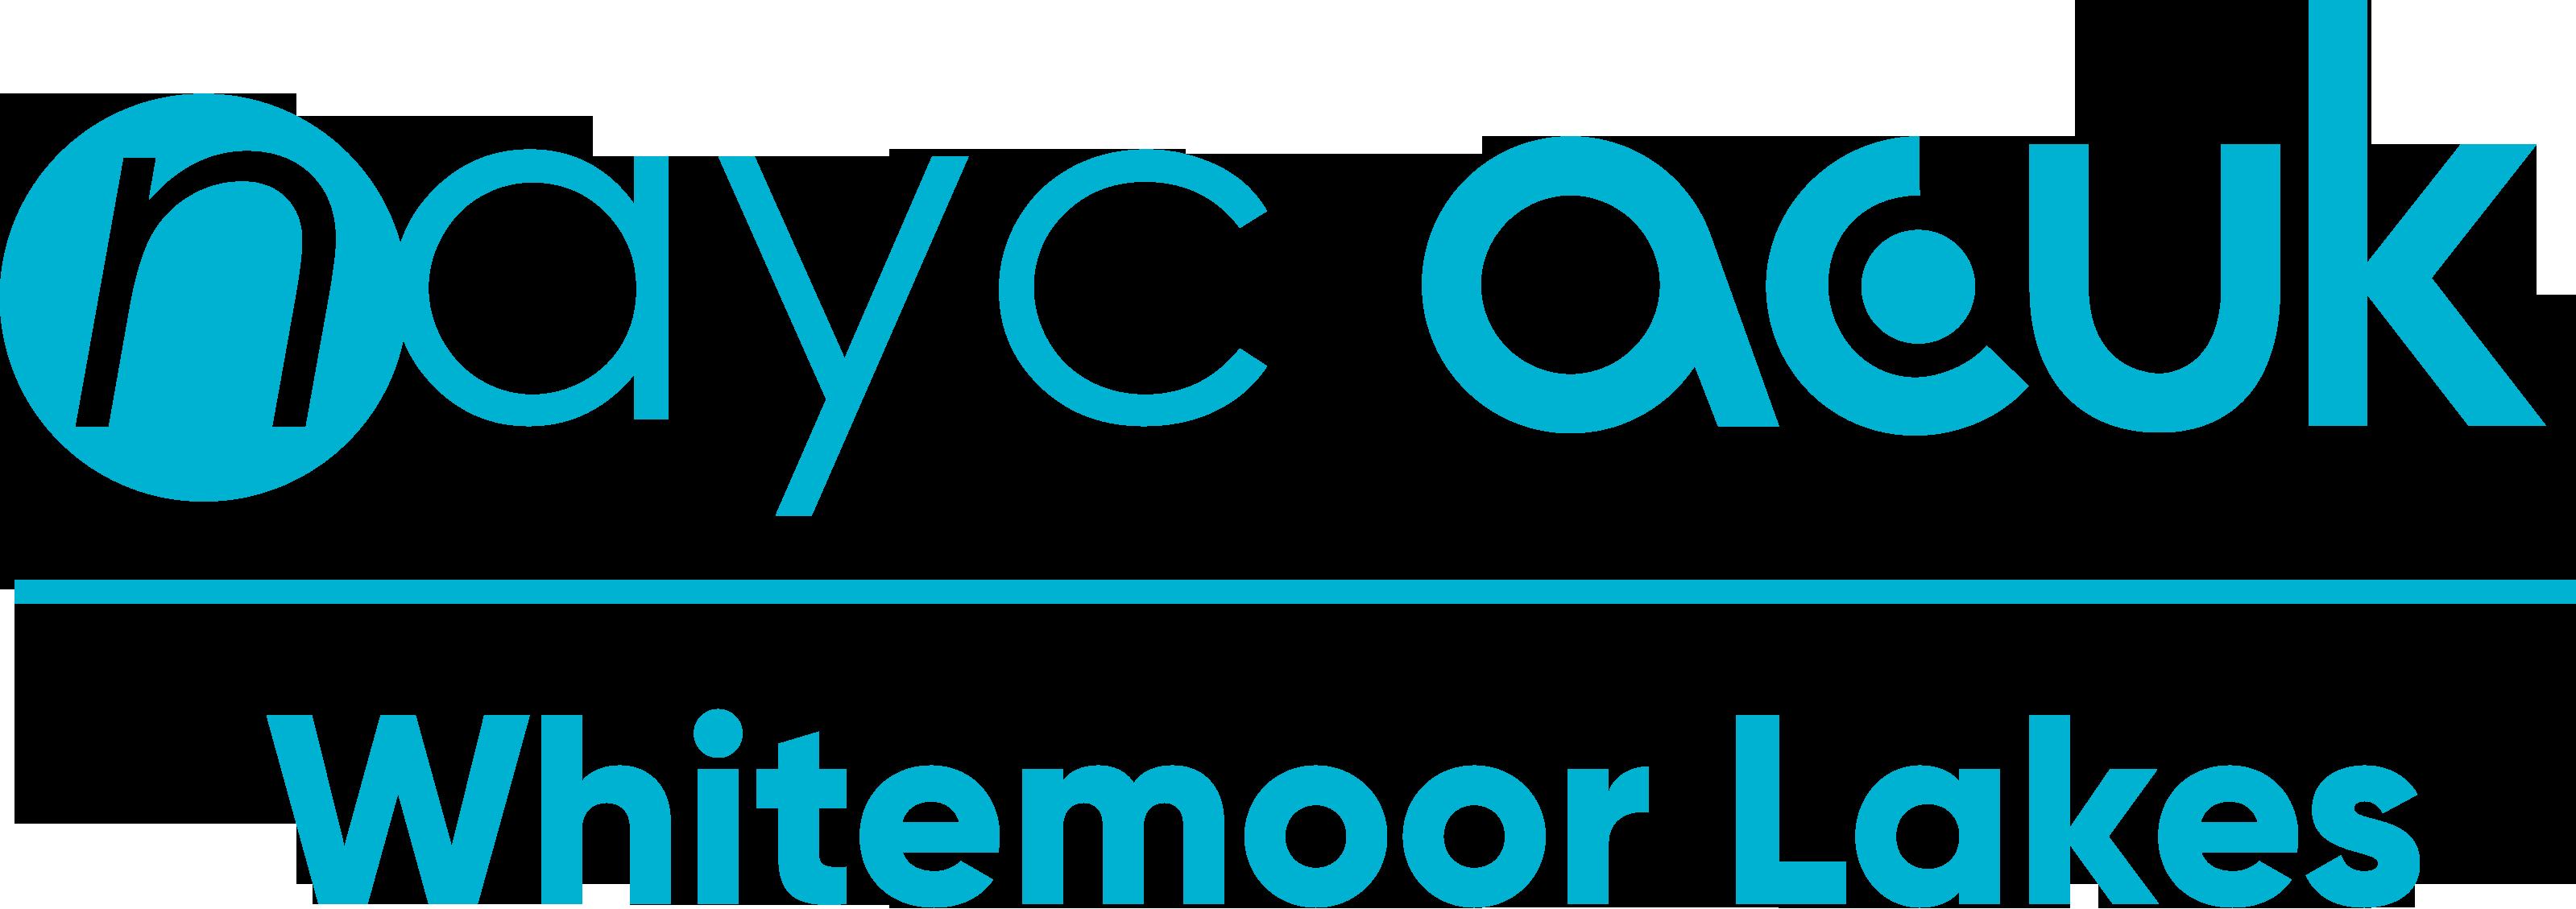 Whitemoor-Lakes-Logo